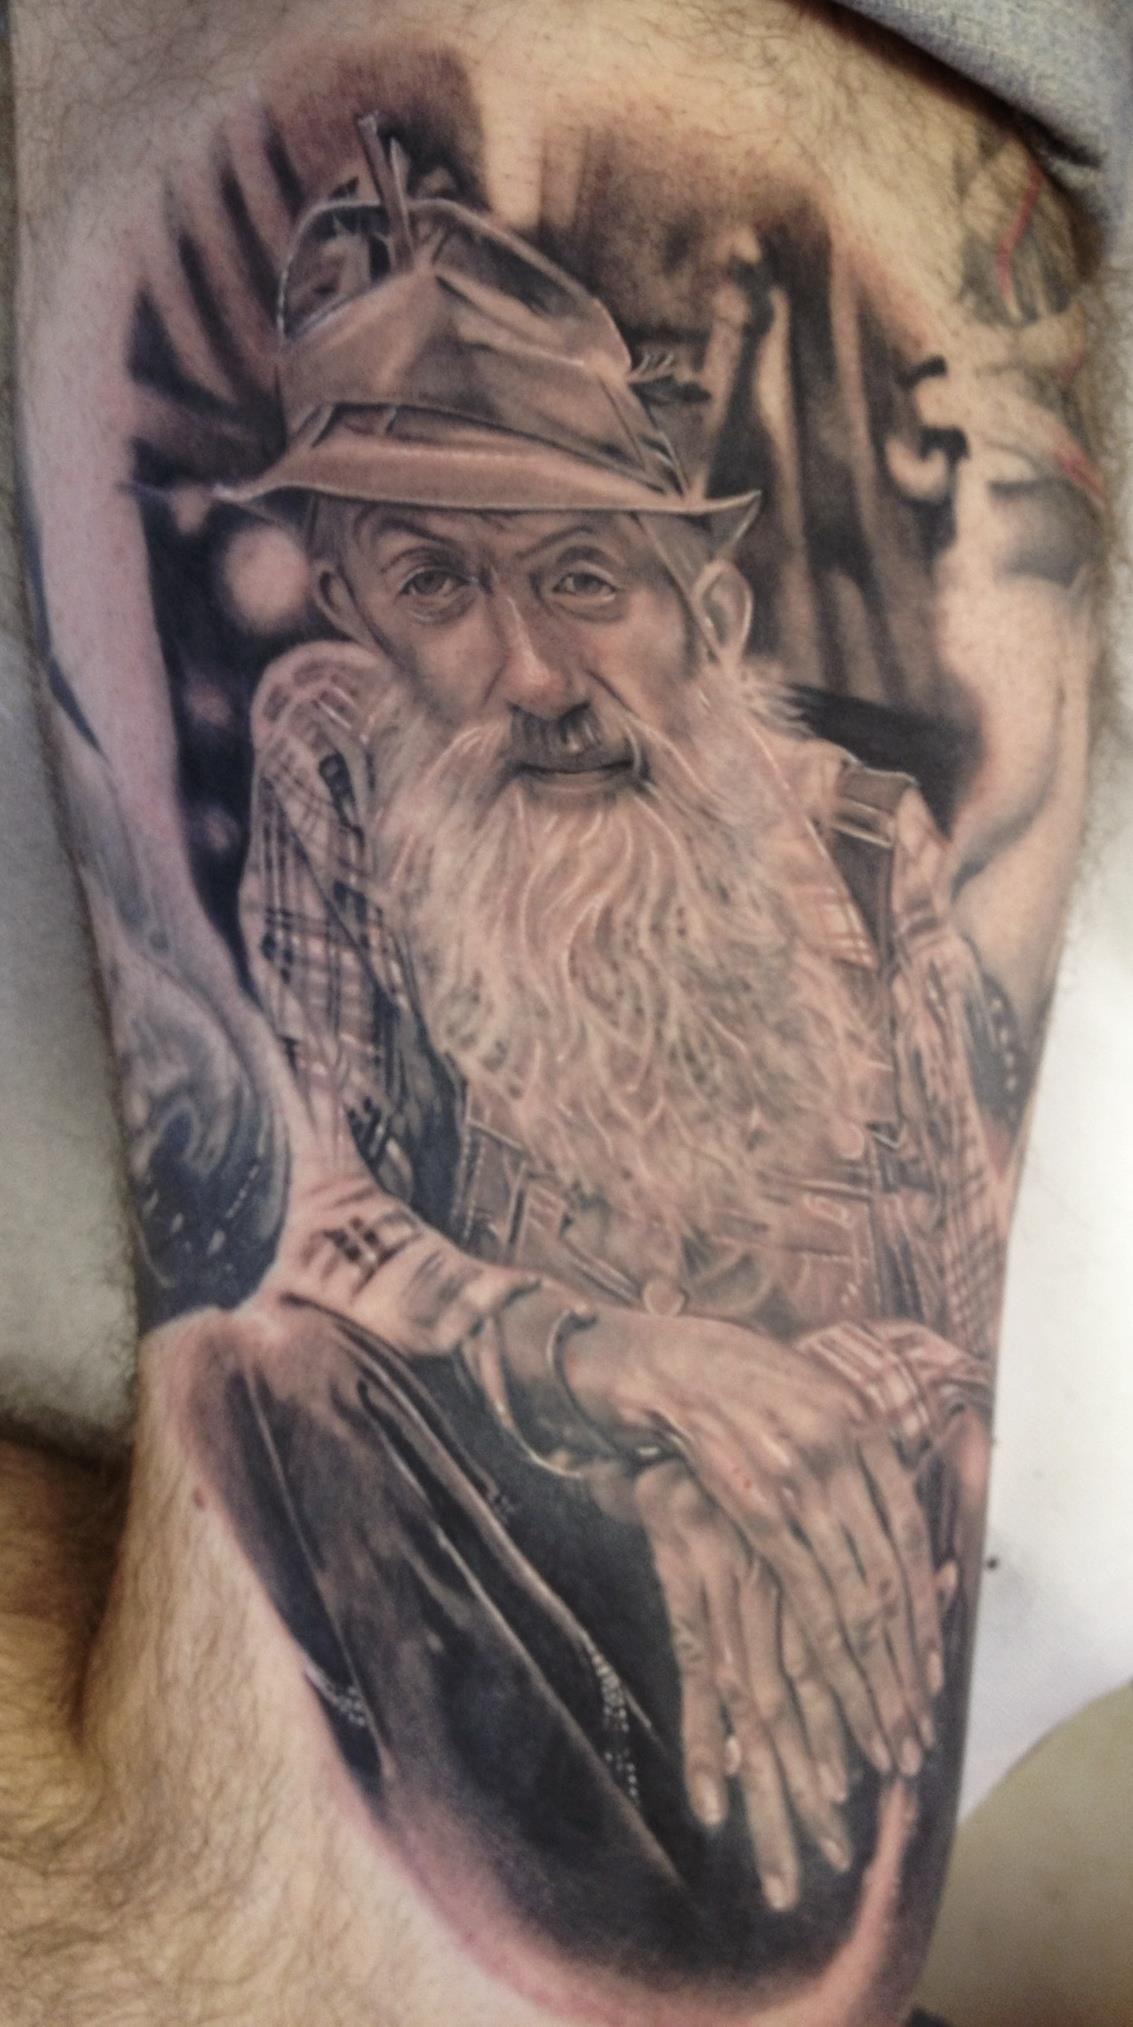 moonshine liquor tattoo - photo #29